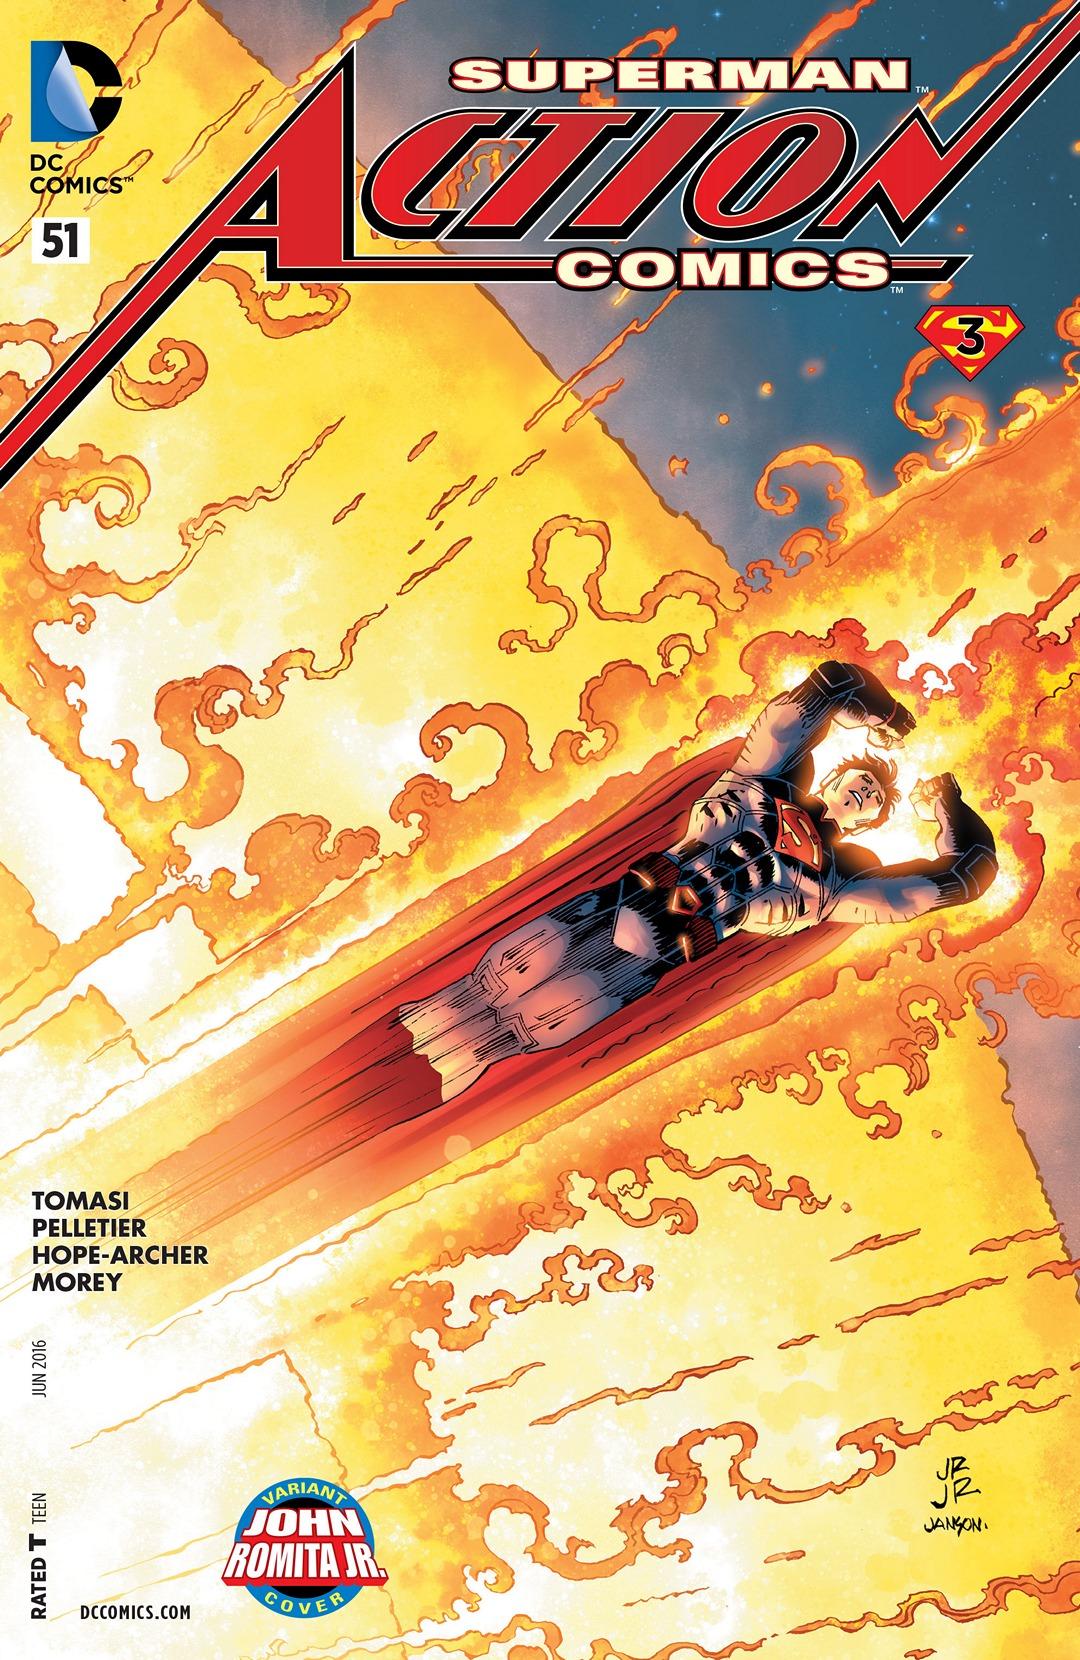 Action Comics Vol 2 51 Romita Jr. Variant.jpg